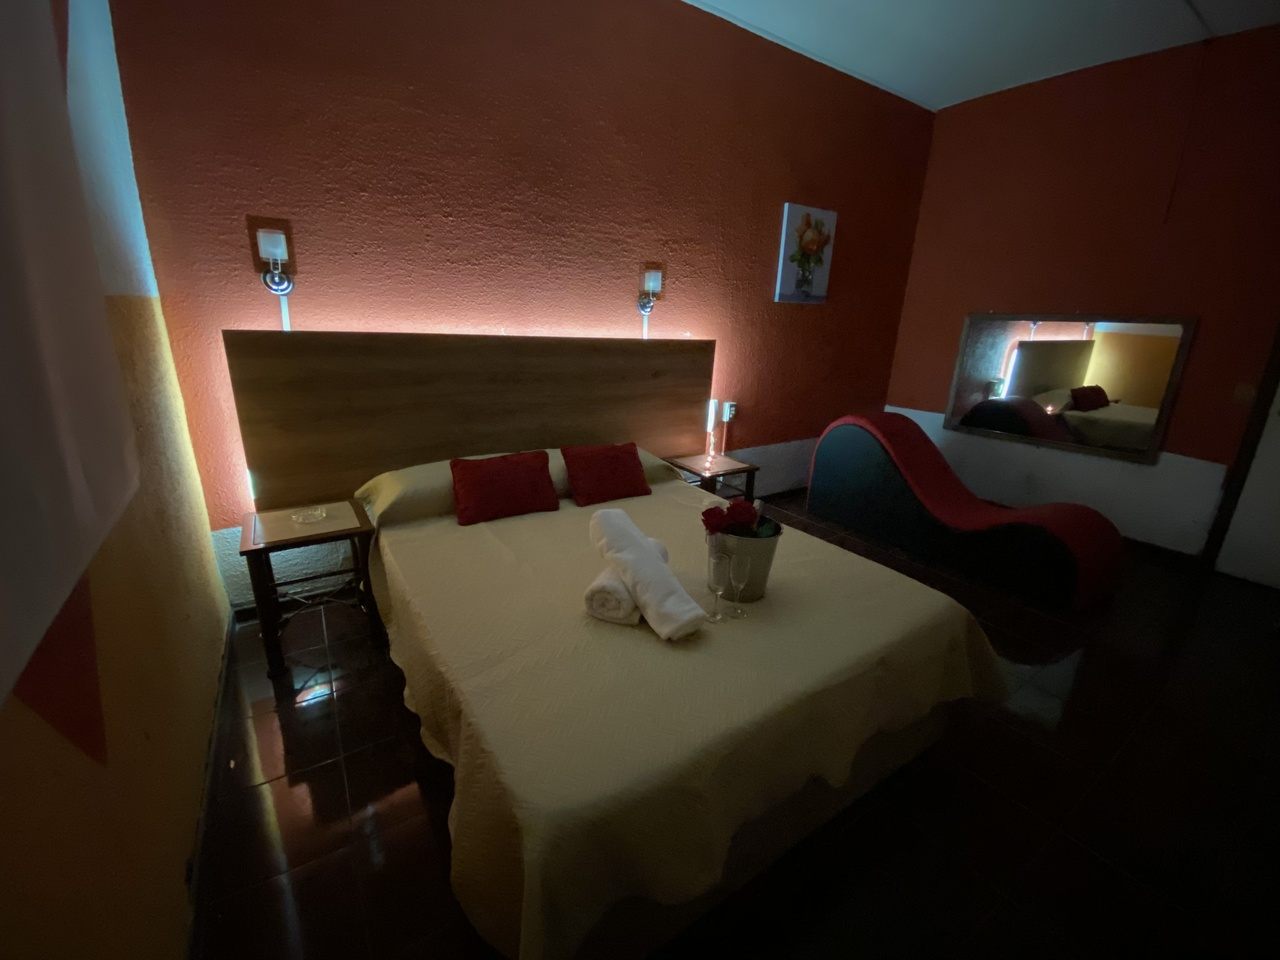 Intimo Hotel Santo Domingo en Santiago : MotelNow